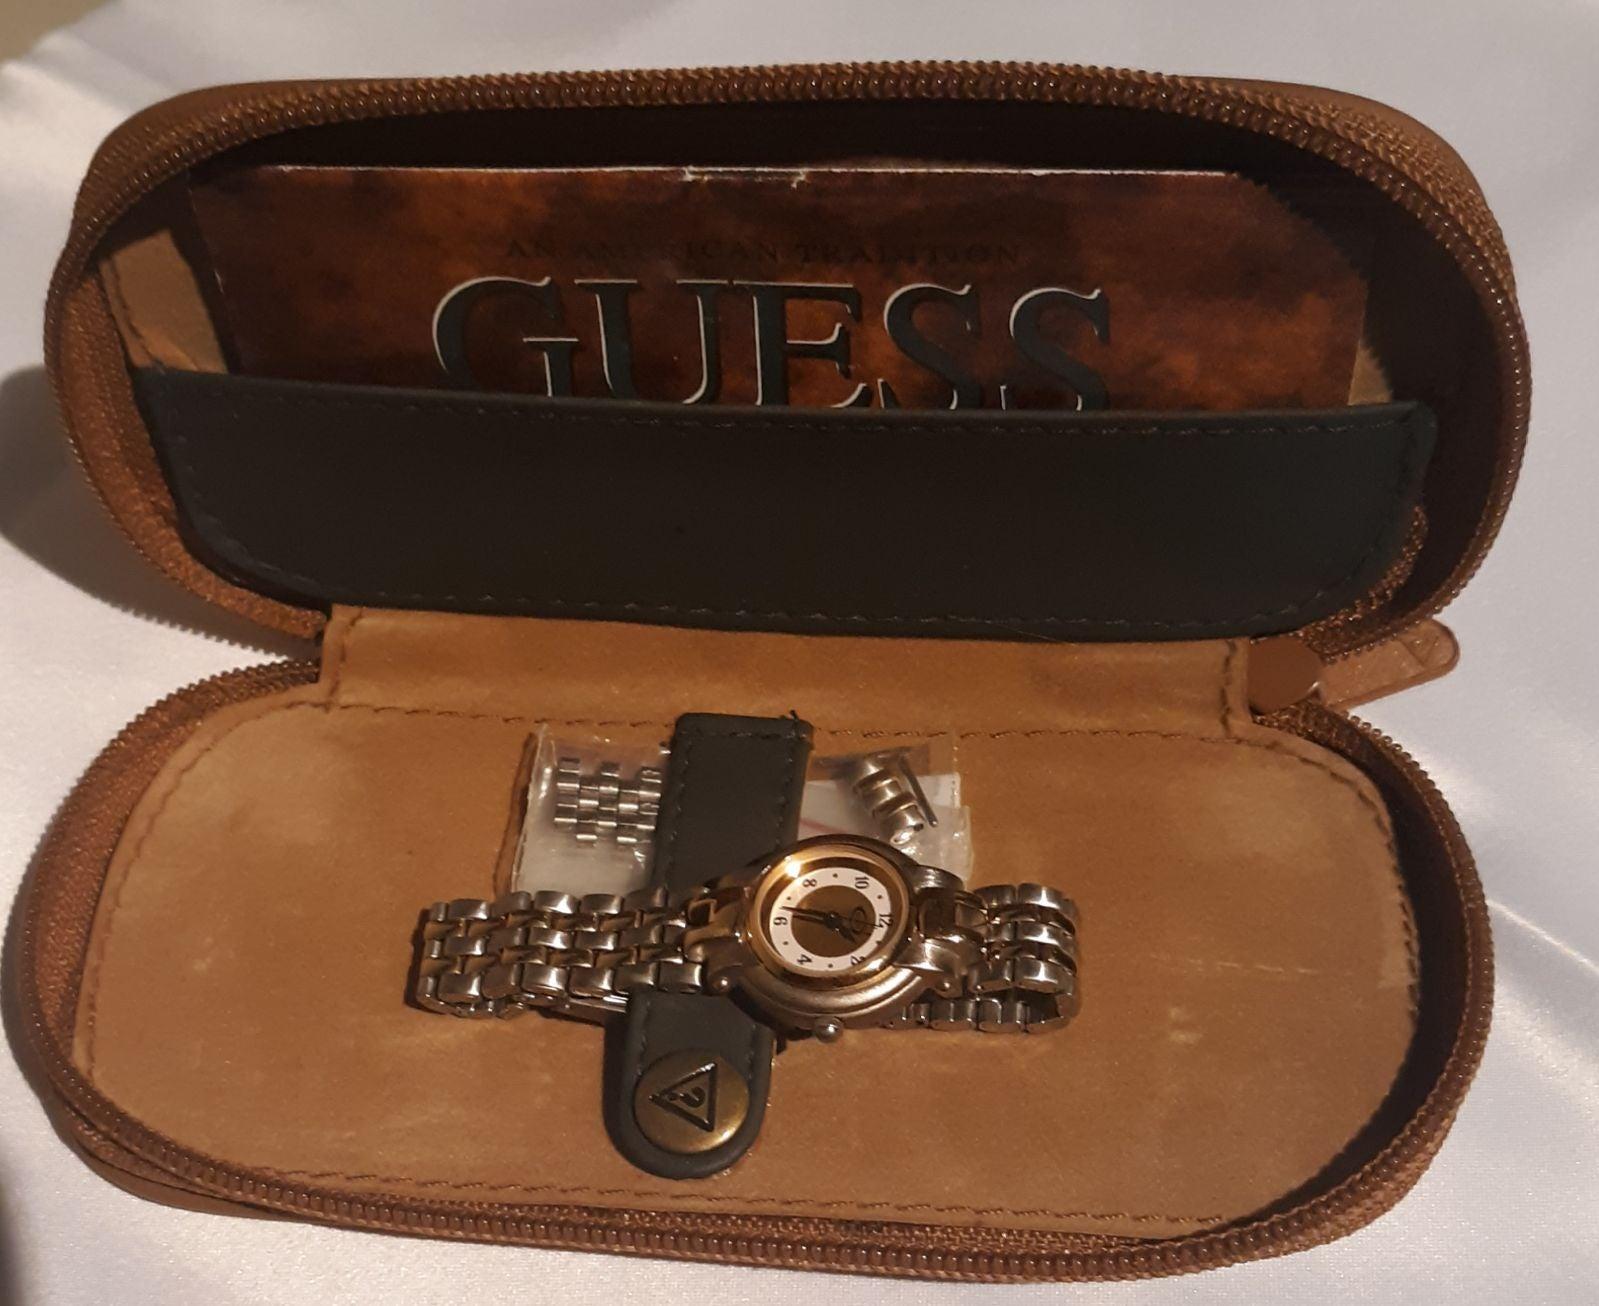 Authentic Vintage Guess watch & case